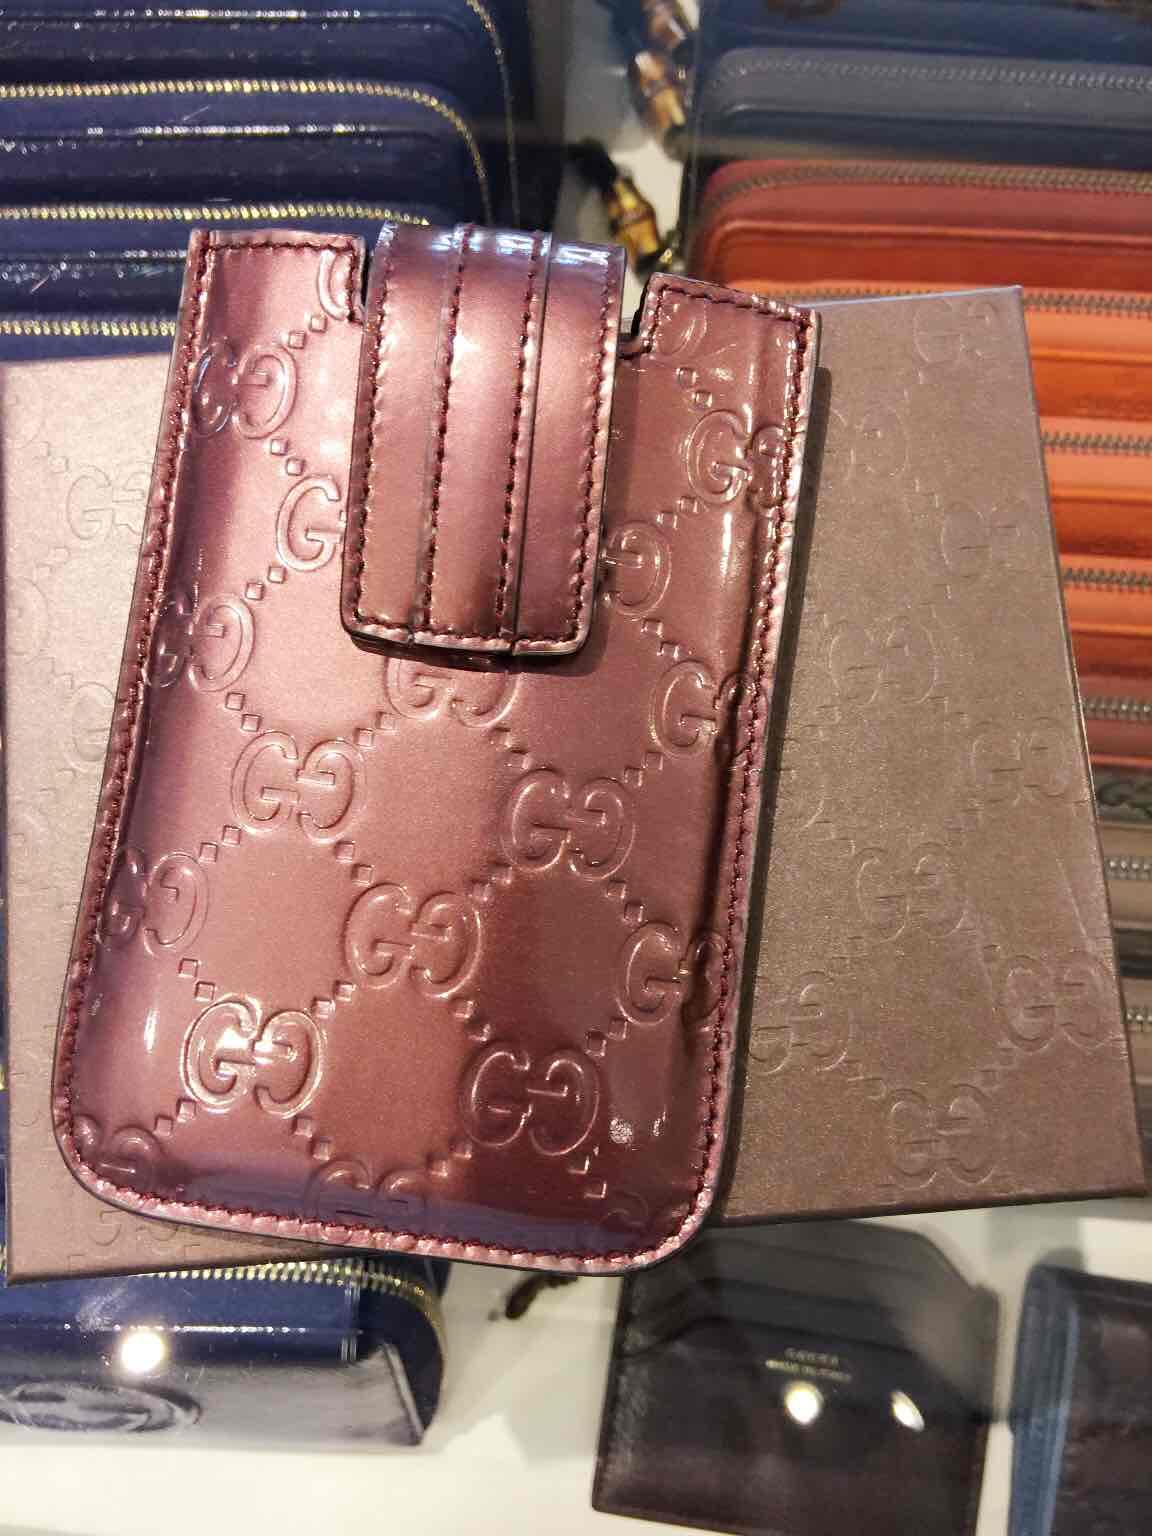 lv gucci还有prada_怎么鉴定GUCCI、prada、Dior、chanel墨镜真假-LV Dior Gucci Chanel Prada ...